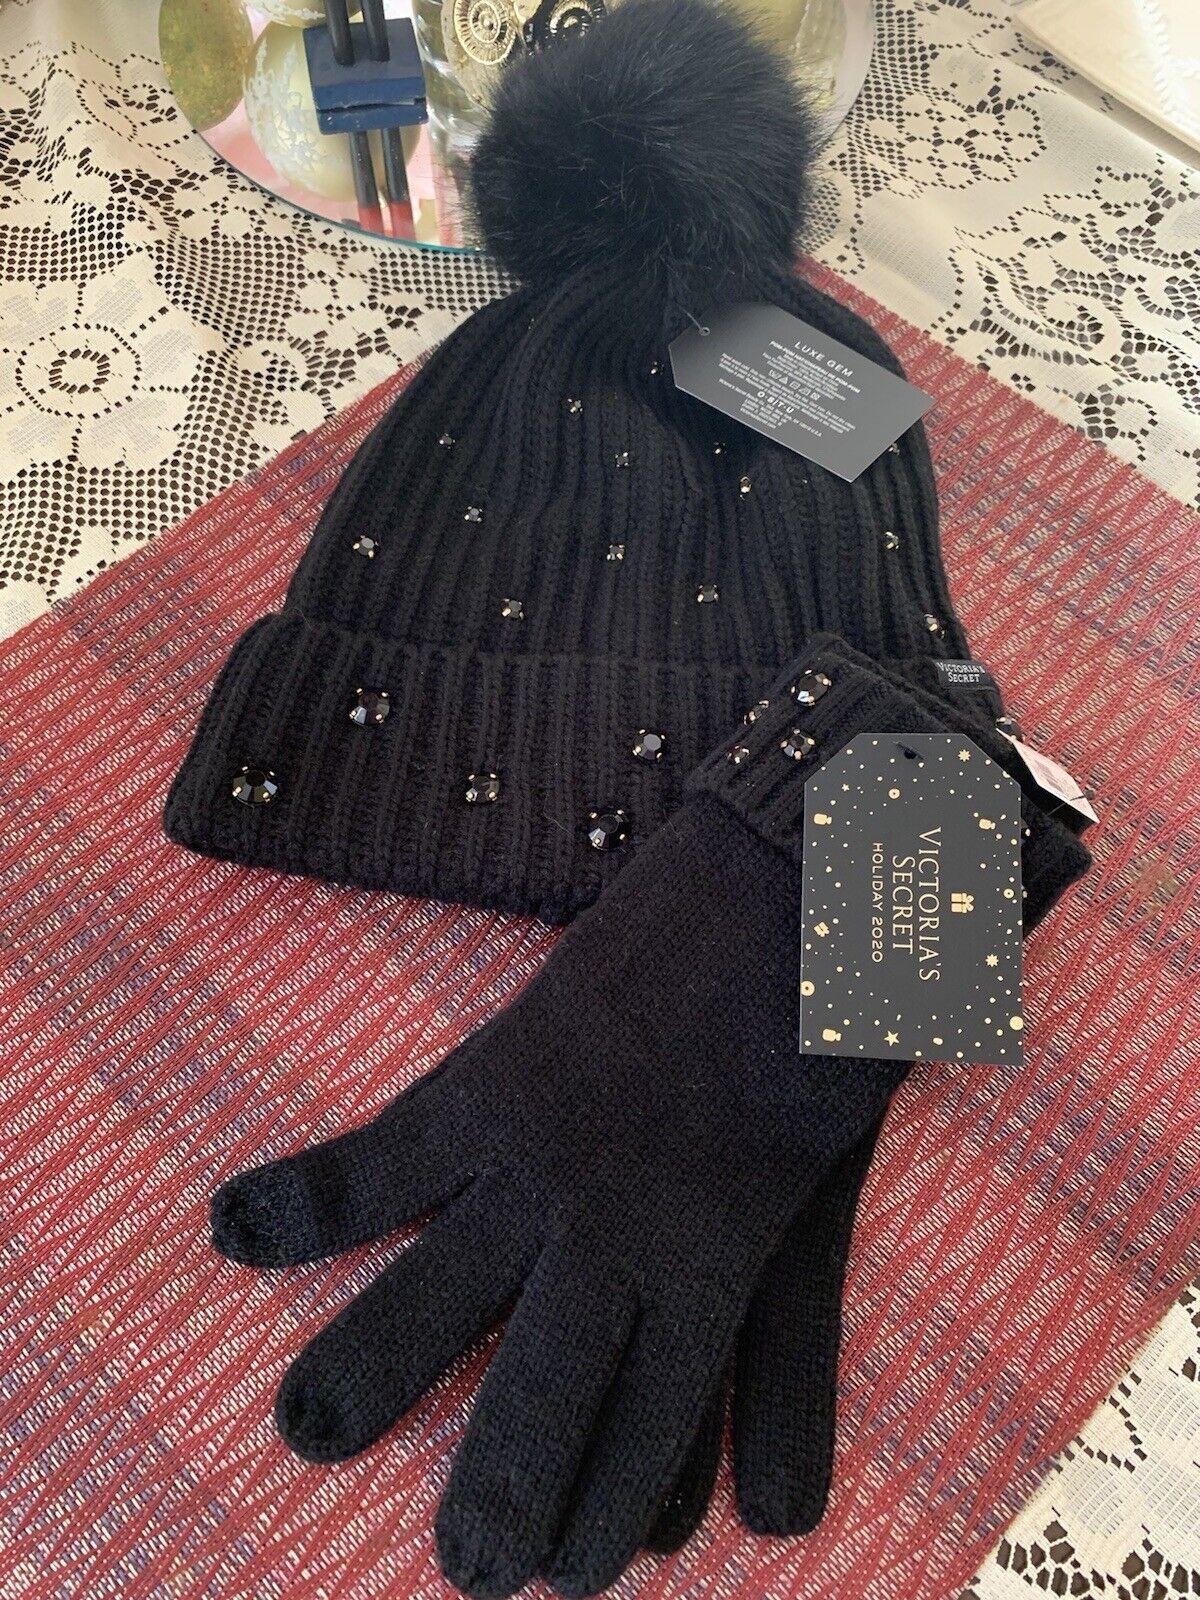 New Victoria Secret Pom-Pom Hat & Glove Set Black Luxe Gem Pom Pom VS